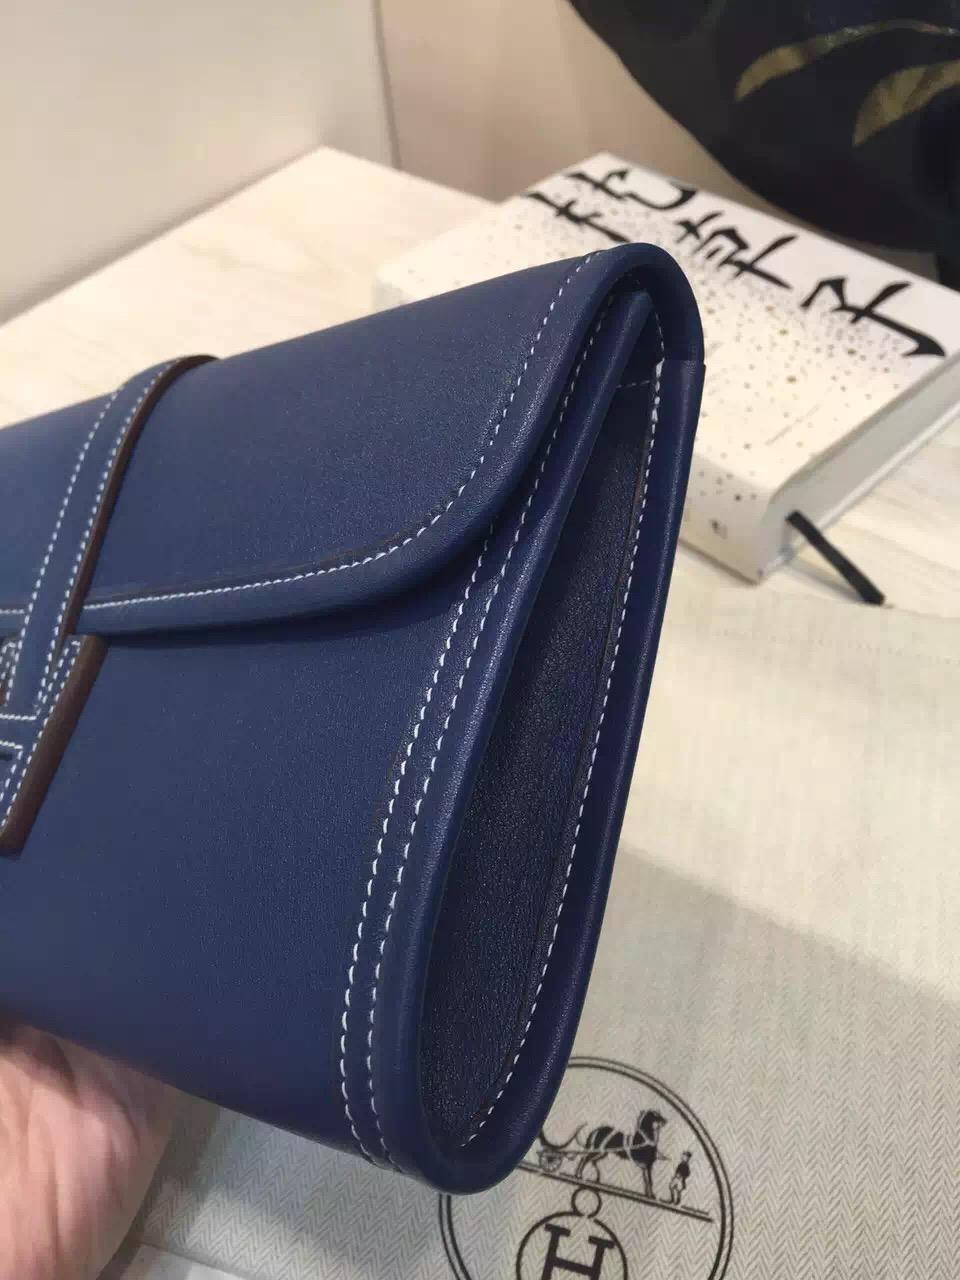 High Quality Hermes Jige Elan Wallet Clutch Bag 7Q Mykono Blue Swift Leather